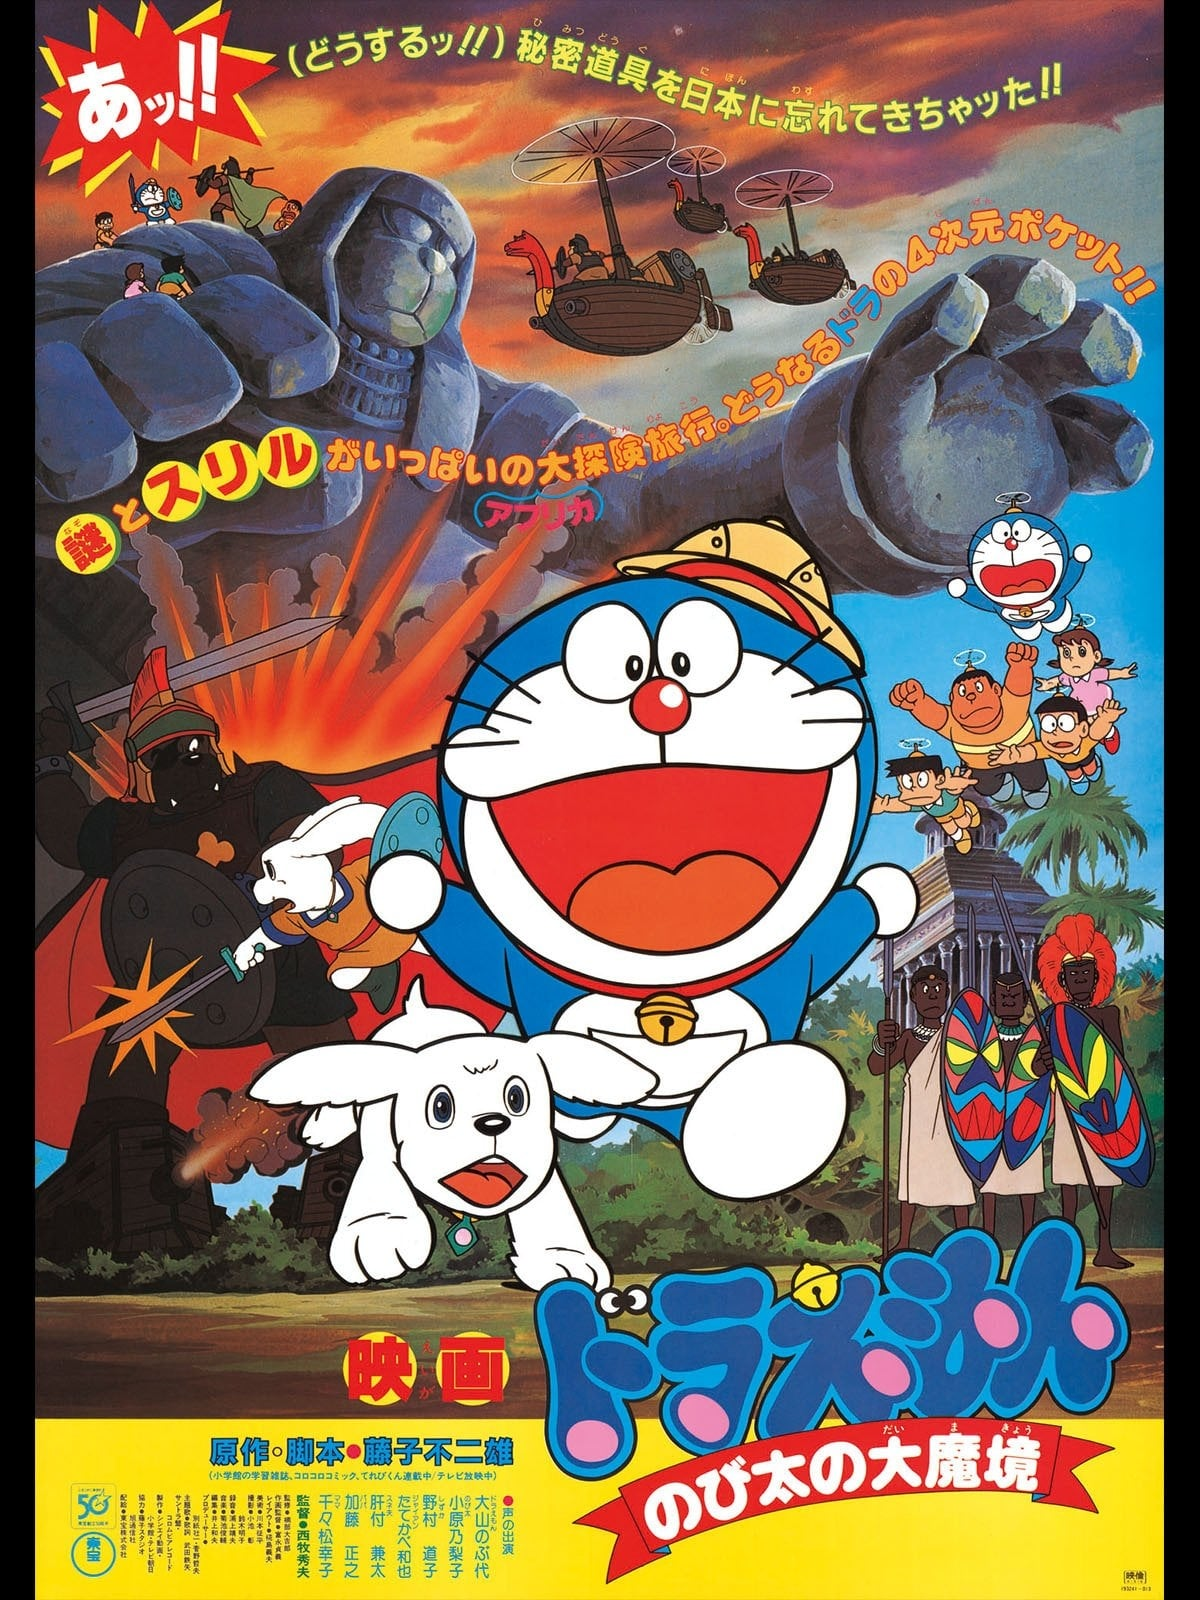 Doraemon: Nobita and the Haunts of Evil (1982)